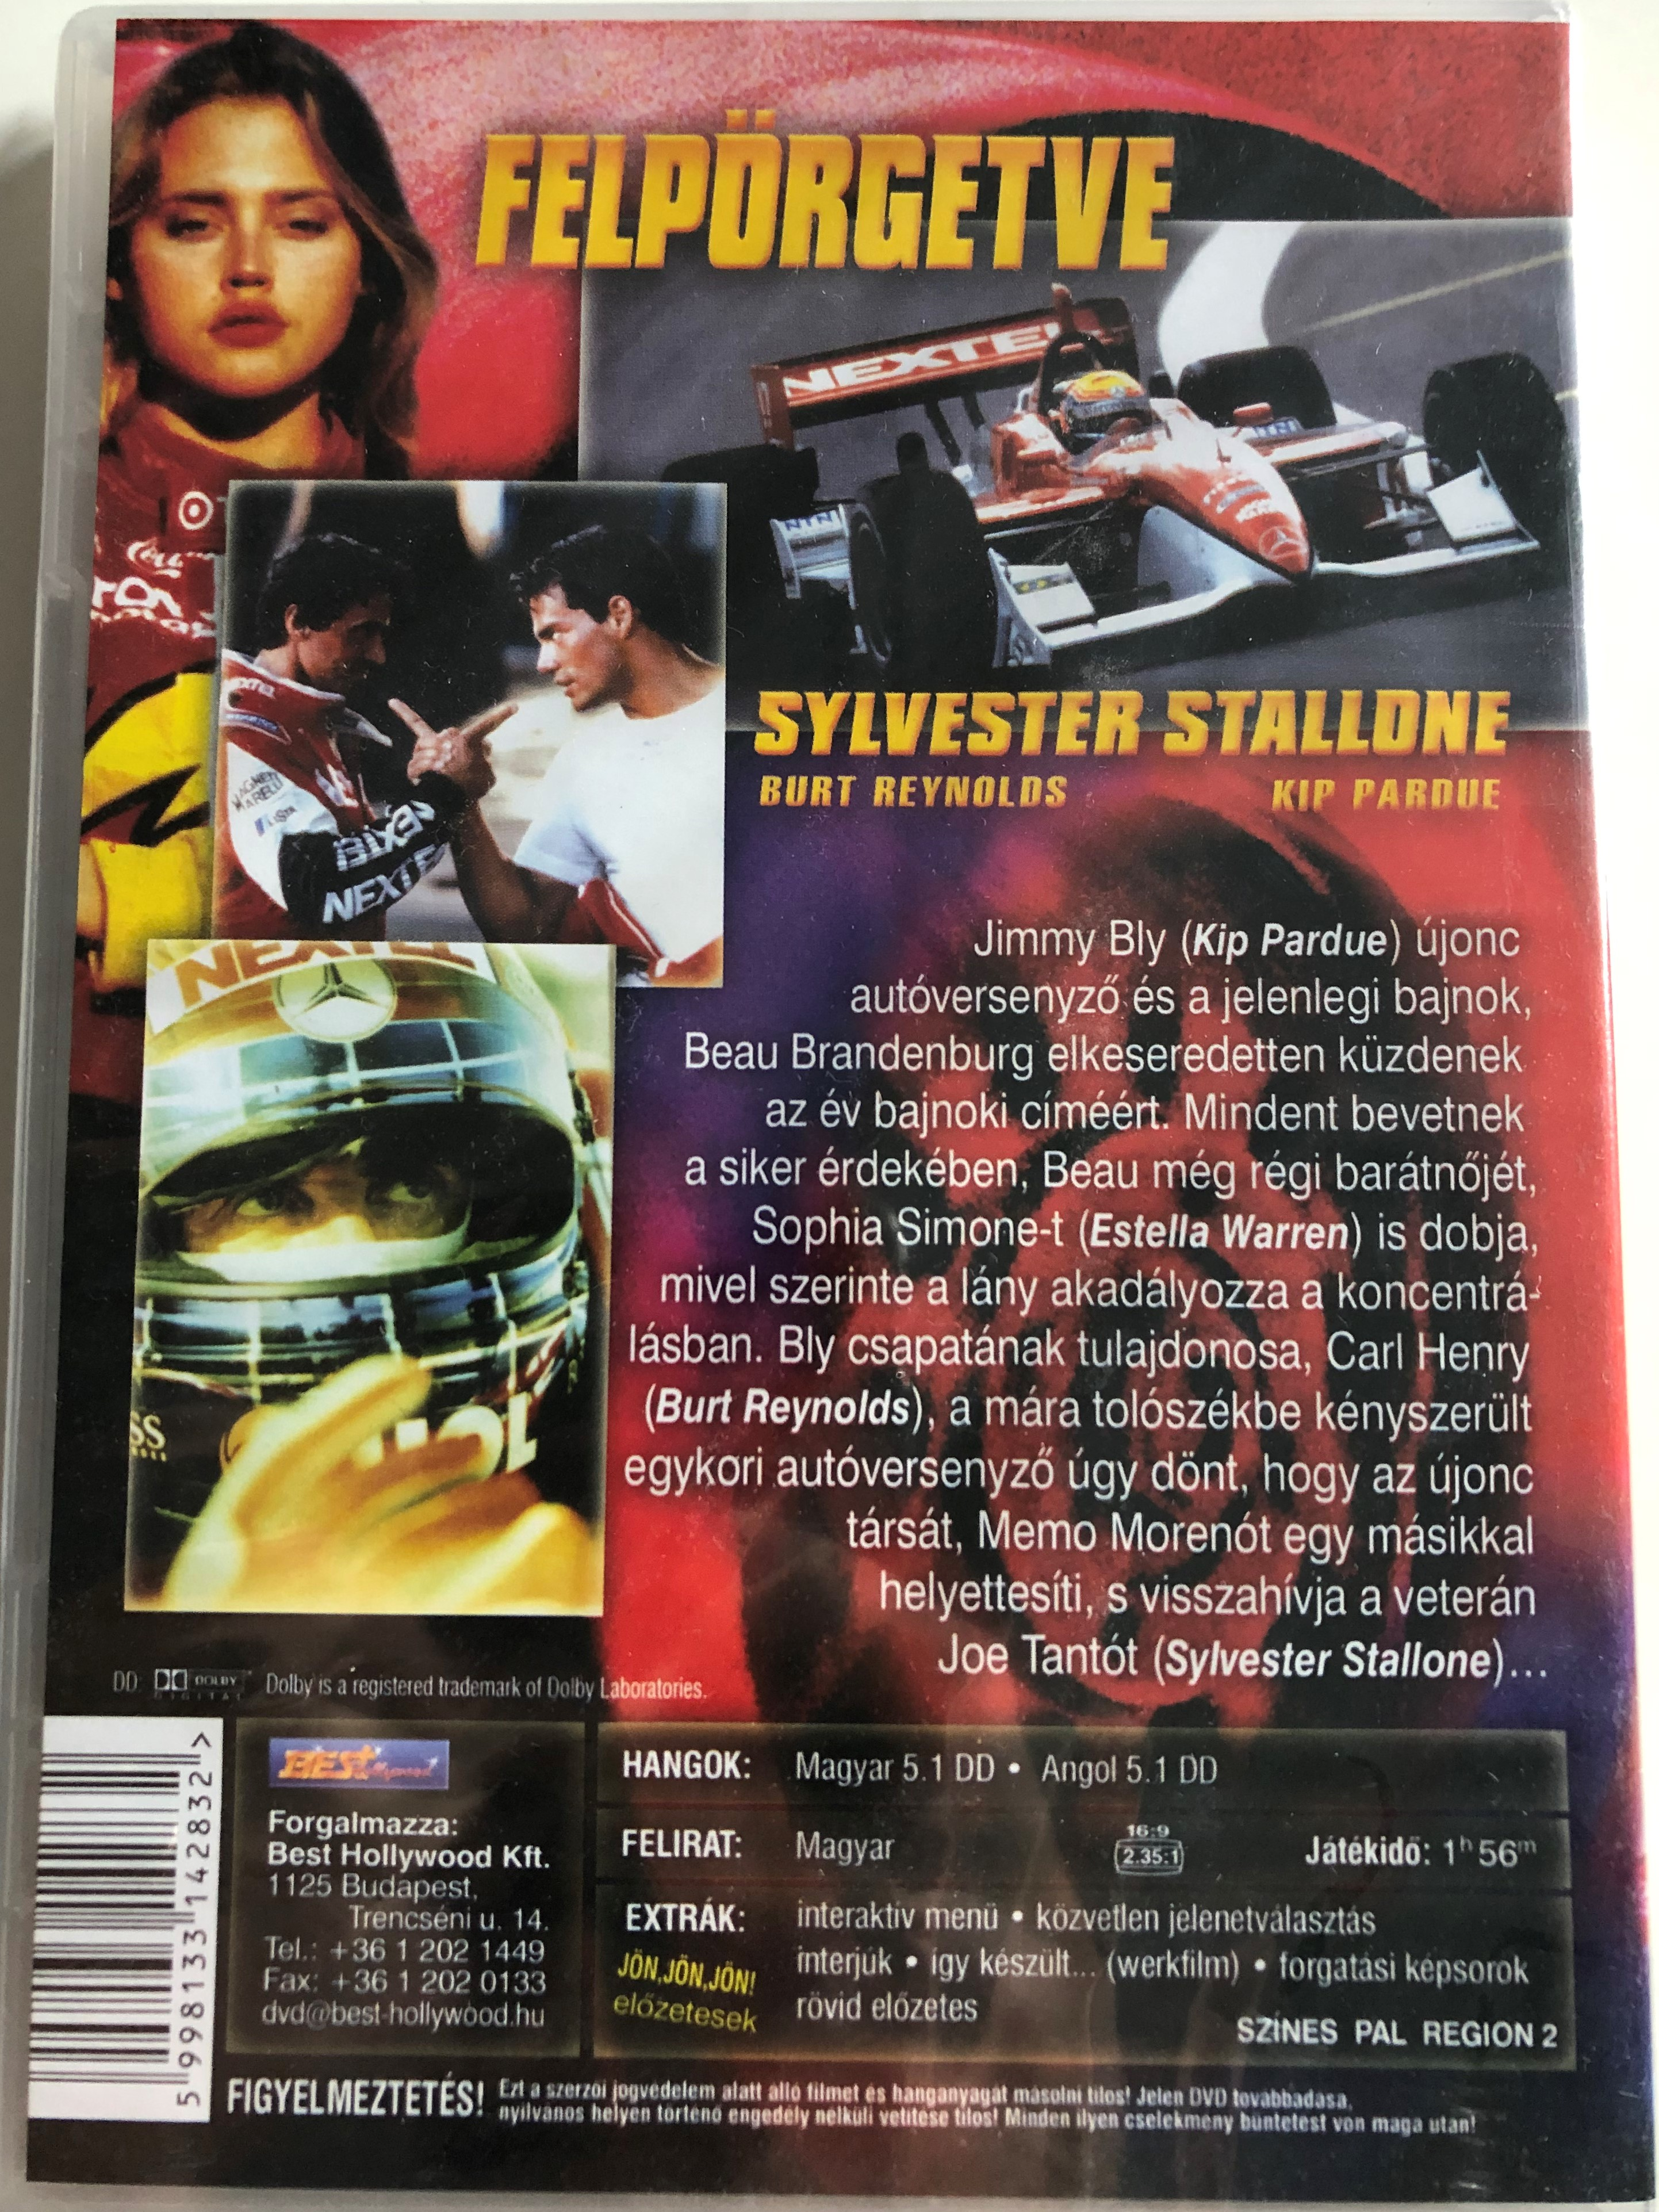 driven-dvd-2001-felp-rgetve-directed-by-renny-harlin-2.jpg